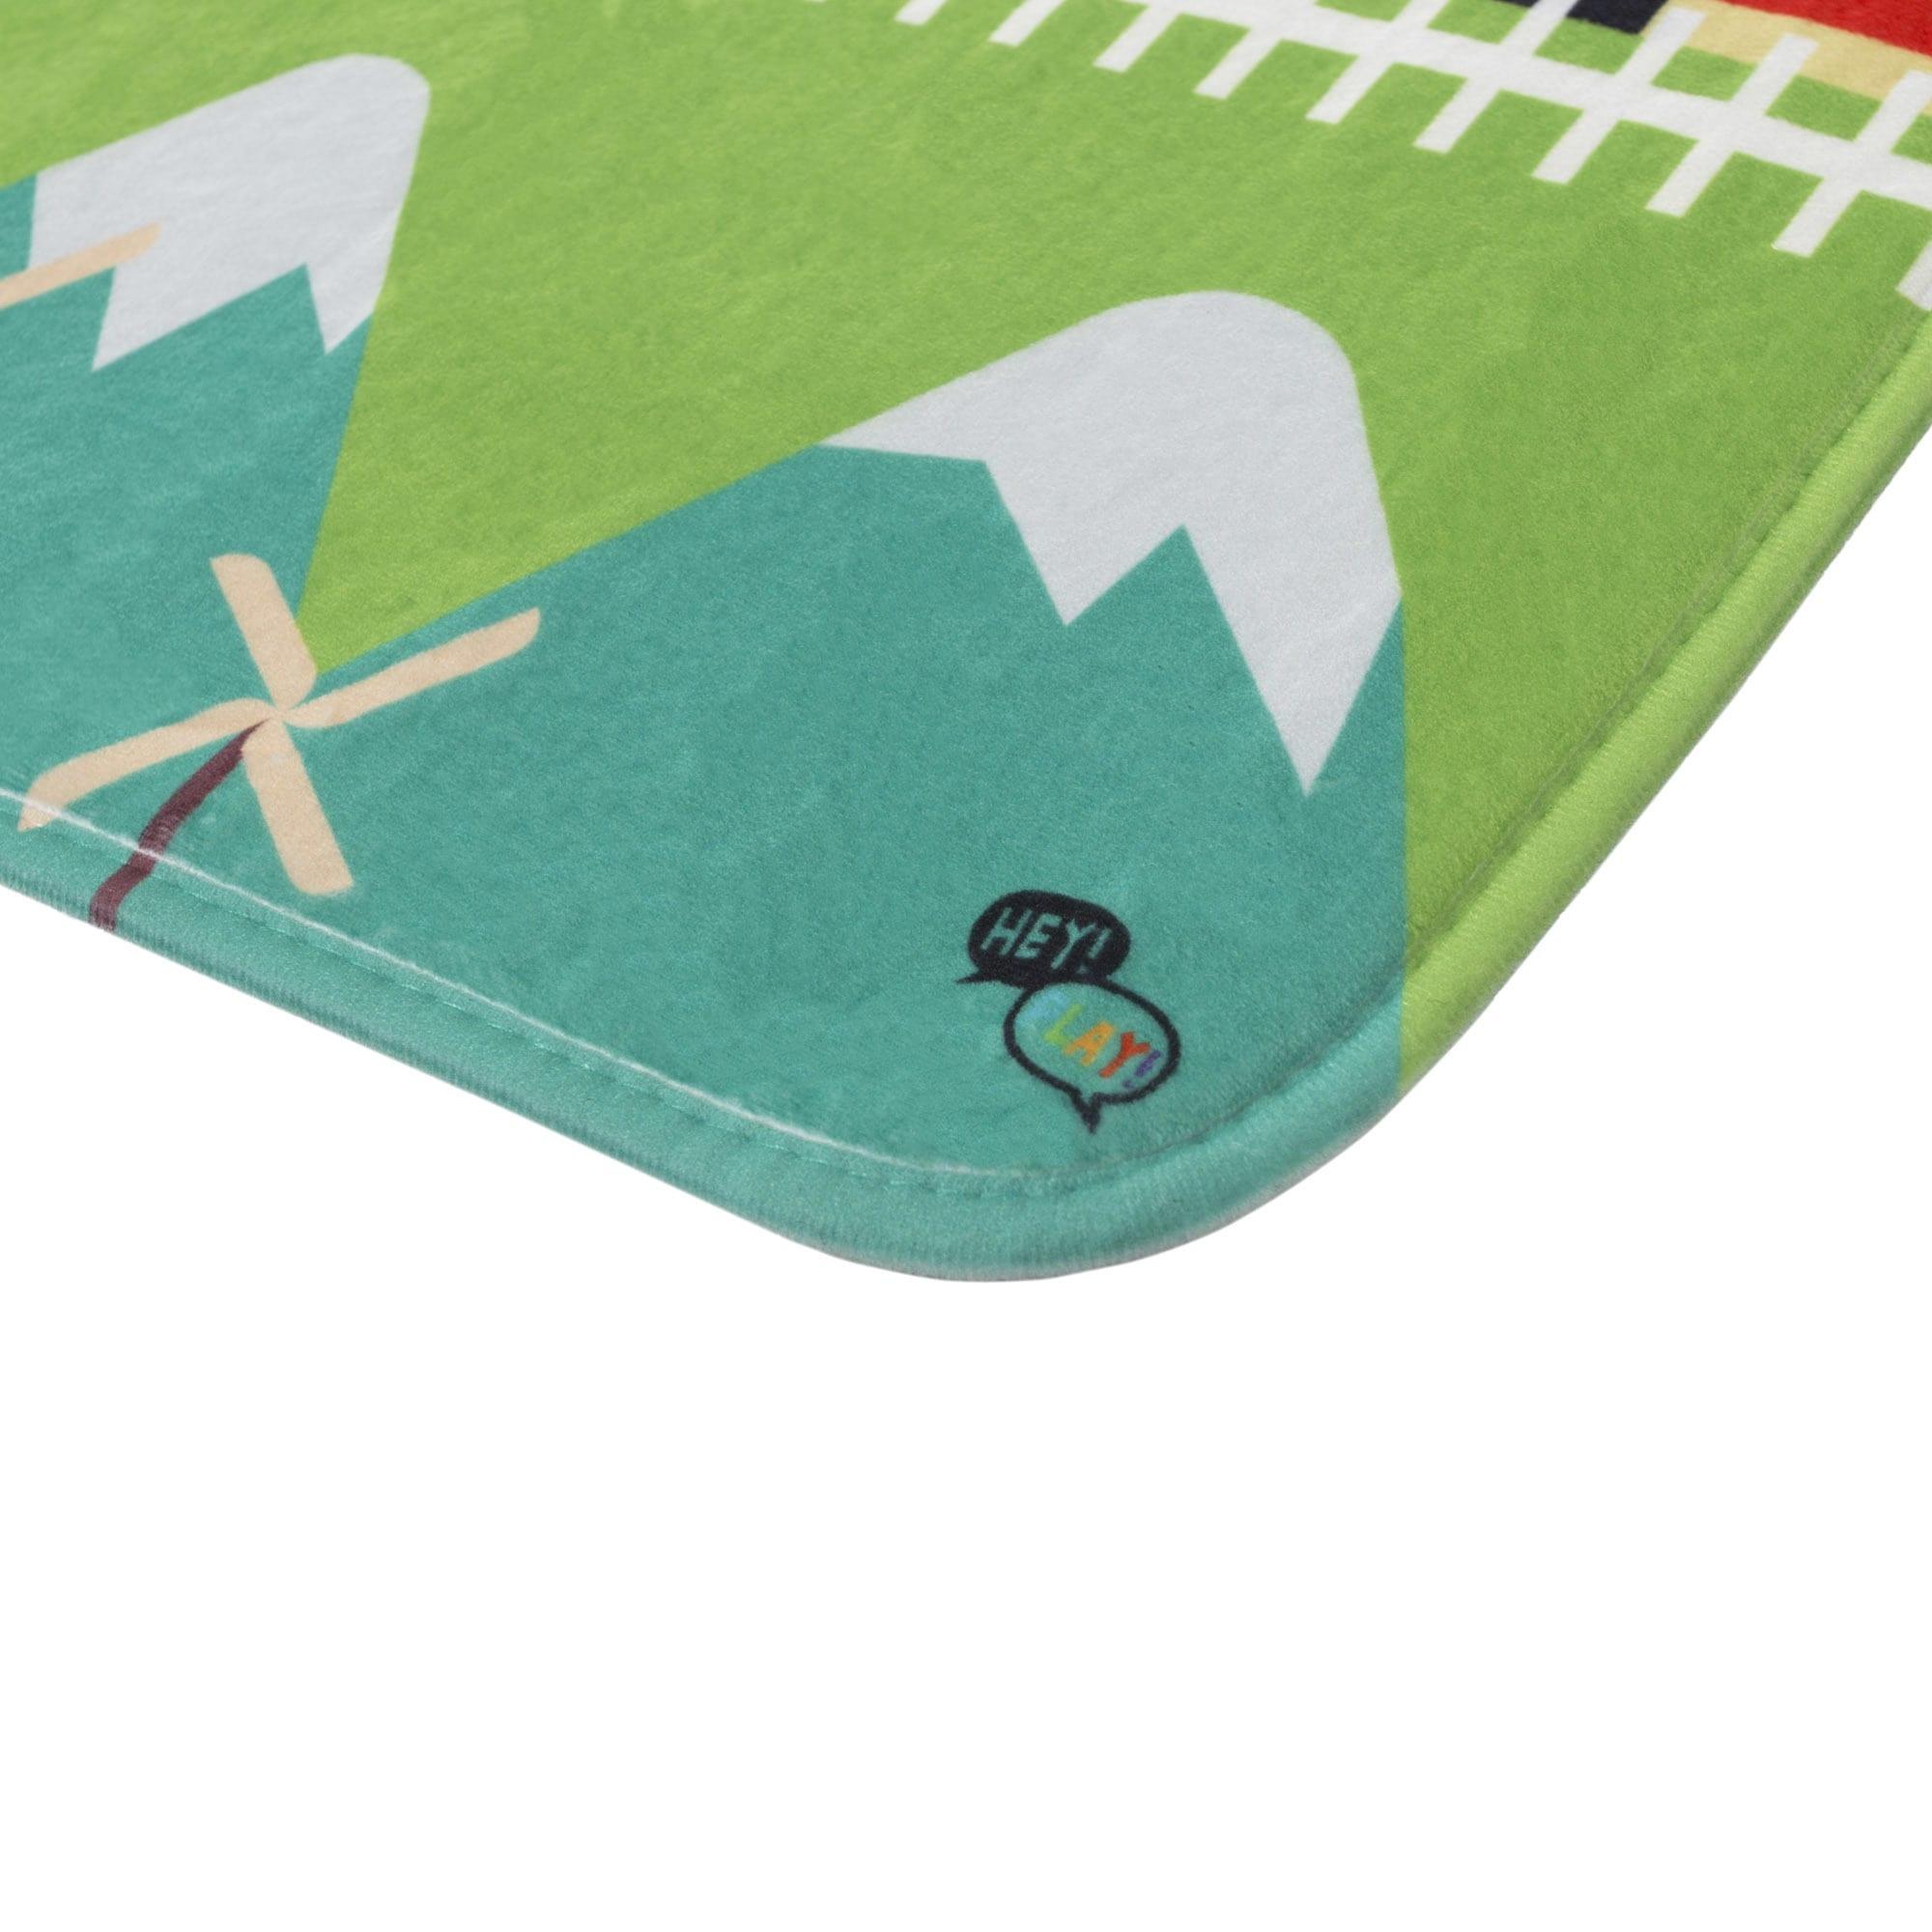 Shop Hey! Play! Baby Play Mat for Kids, Microfiber Flannel Fleece ...